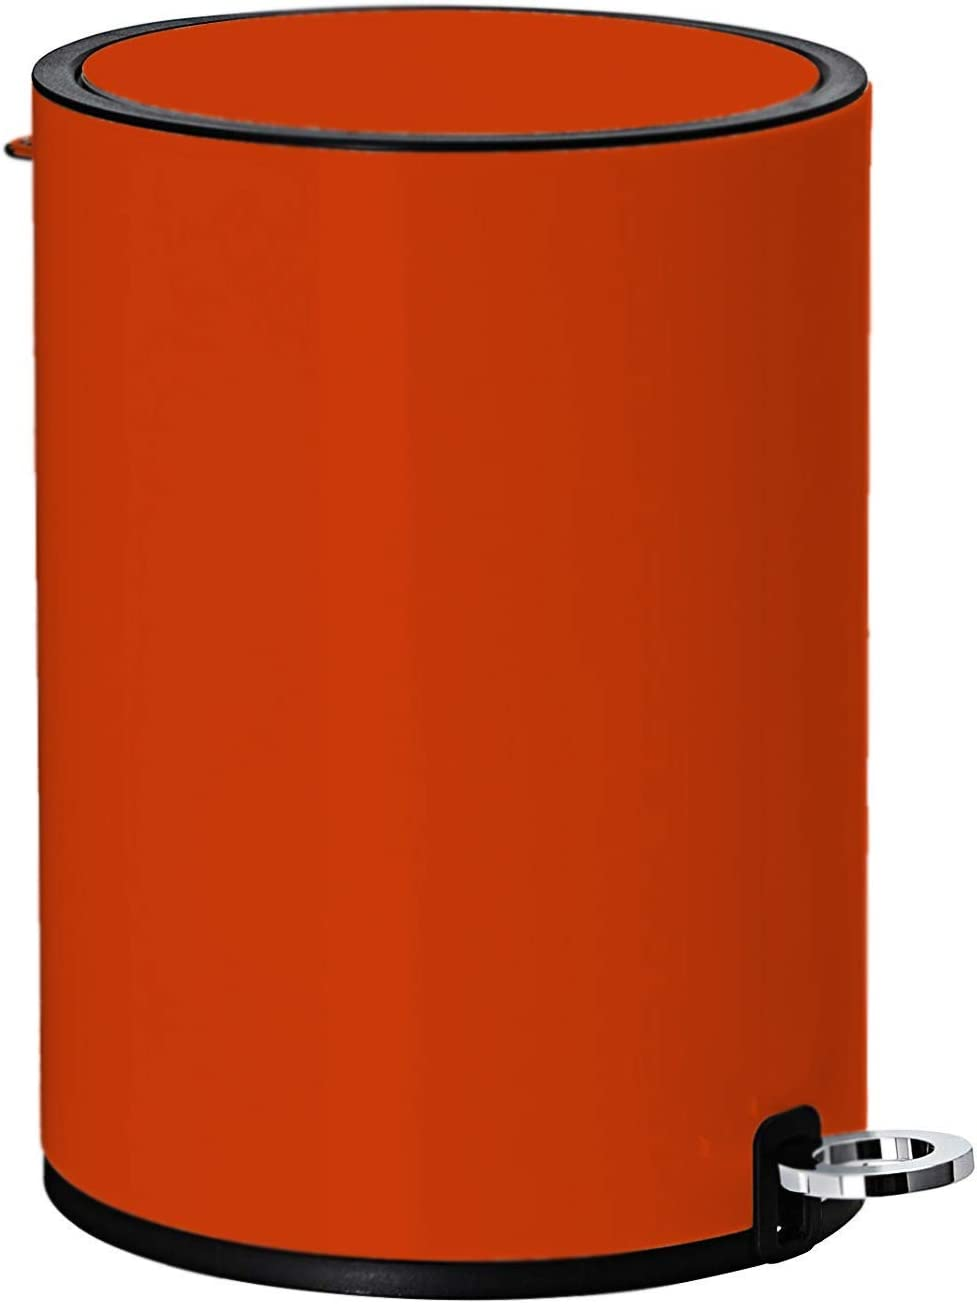 Grey, 6L FurnitureXtra/™ Modern Style Powder Coated Soft Close Pedal Bin ABS lid Plastic Inner bucket